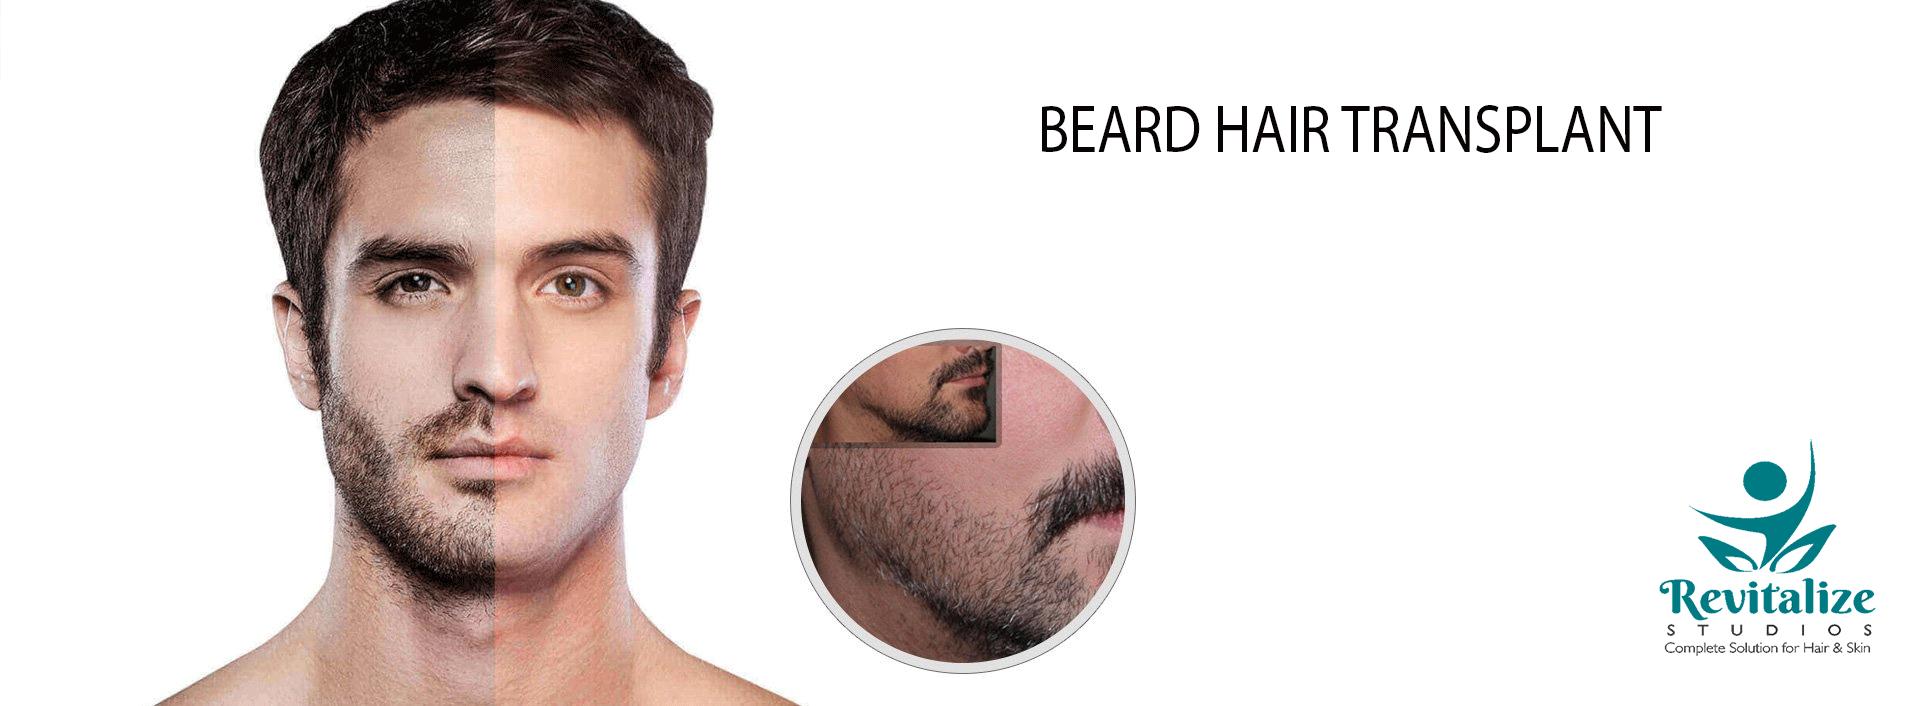 Beard Transplant Beard transplant, Beard, Best hair